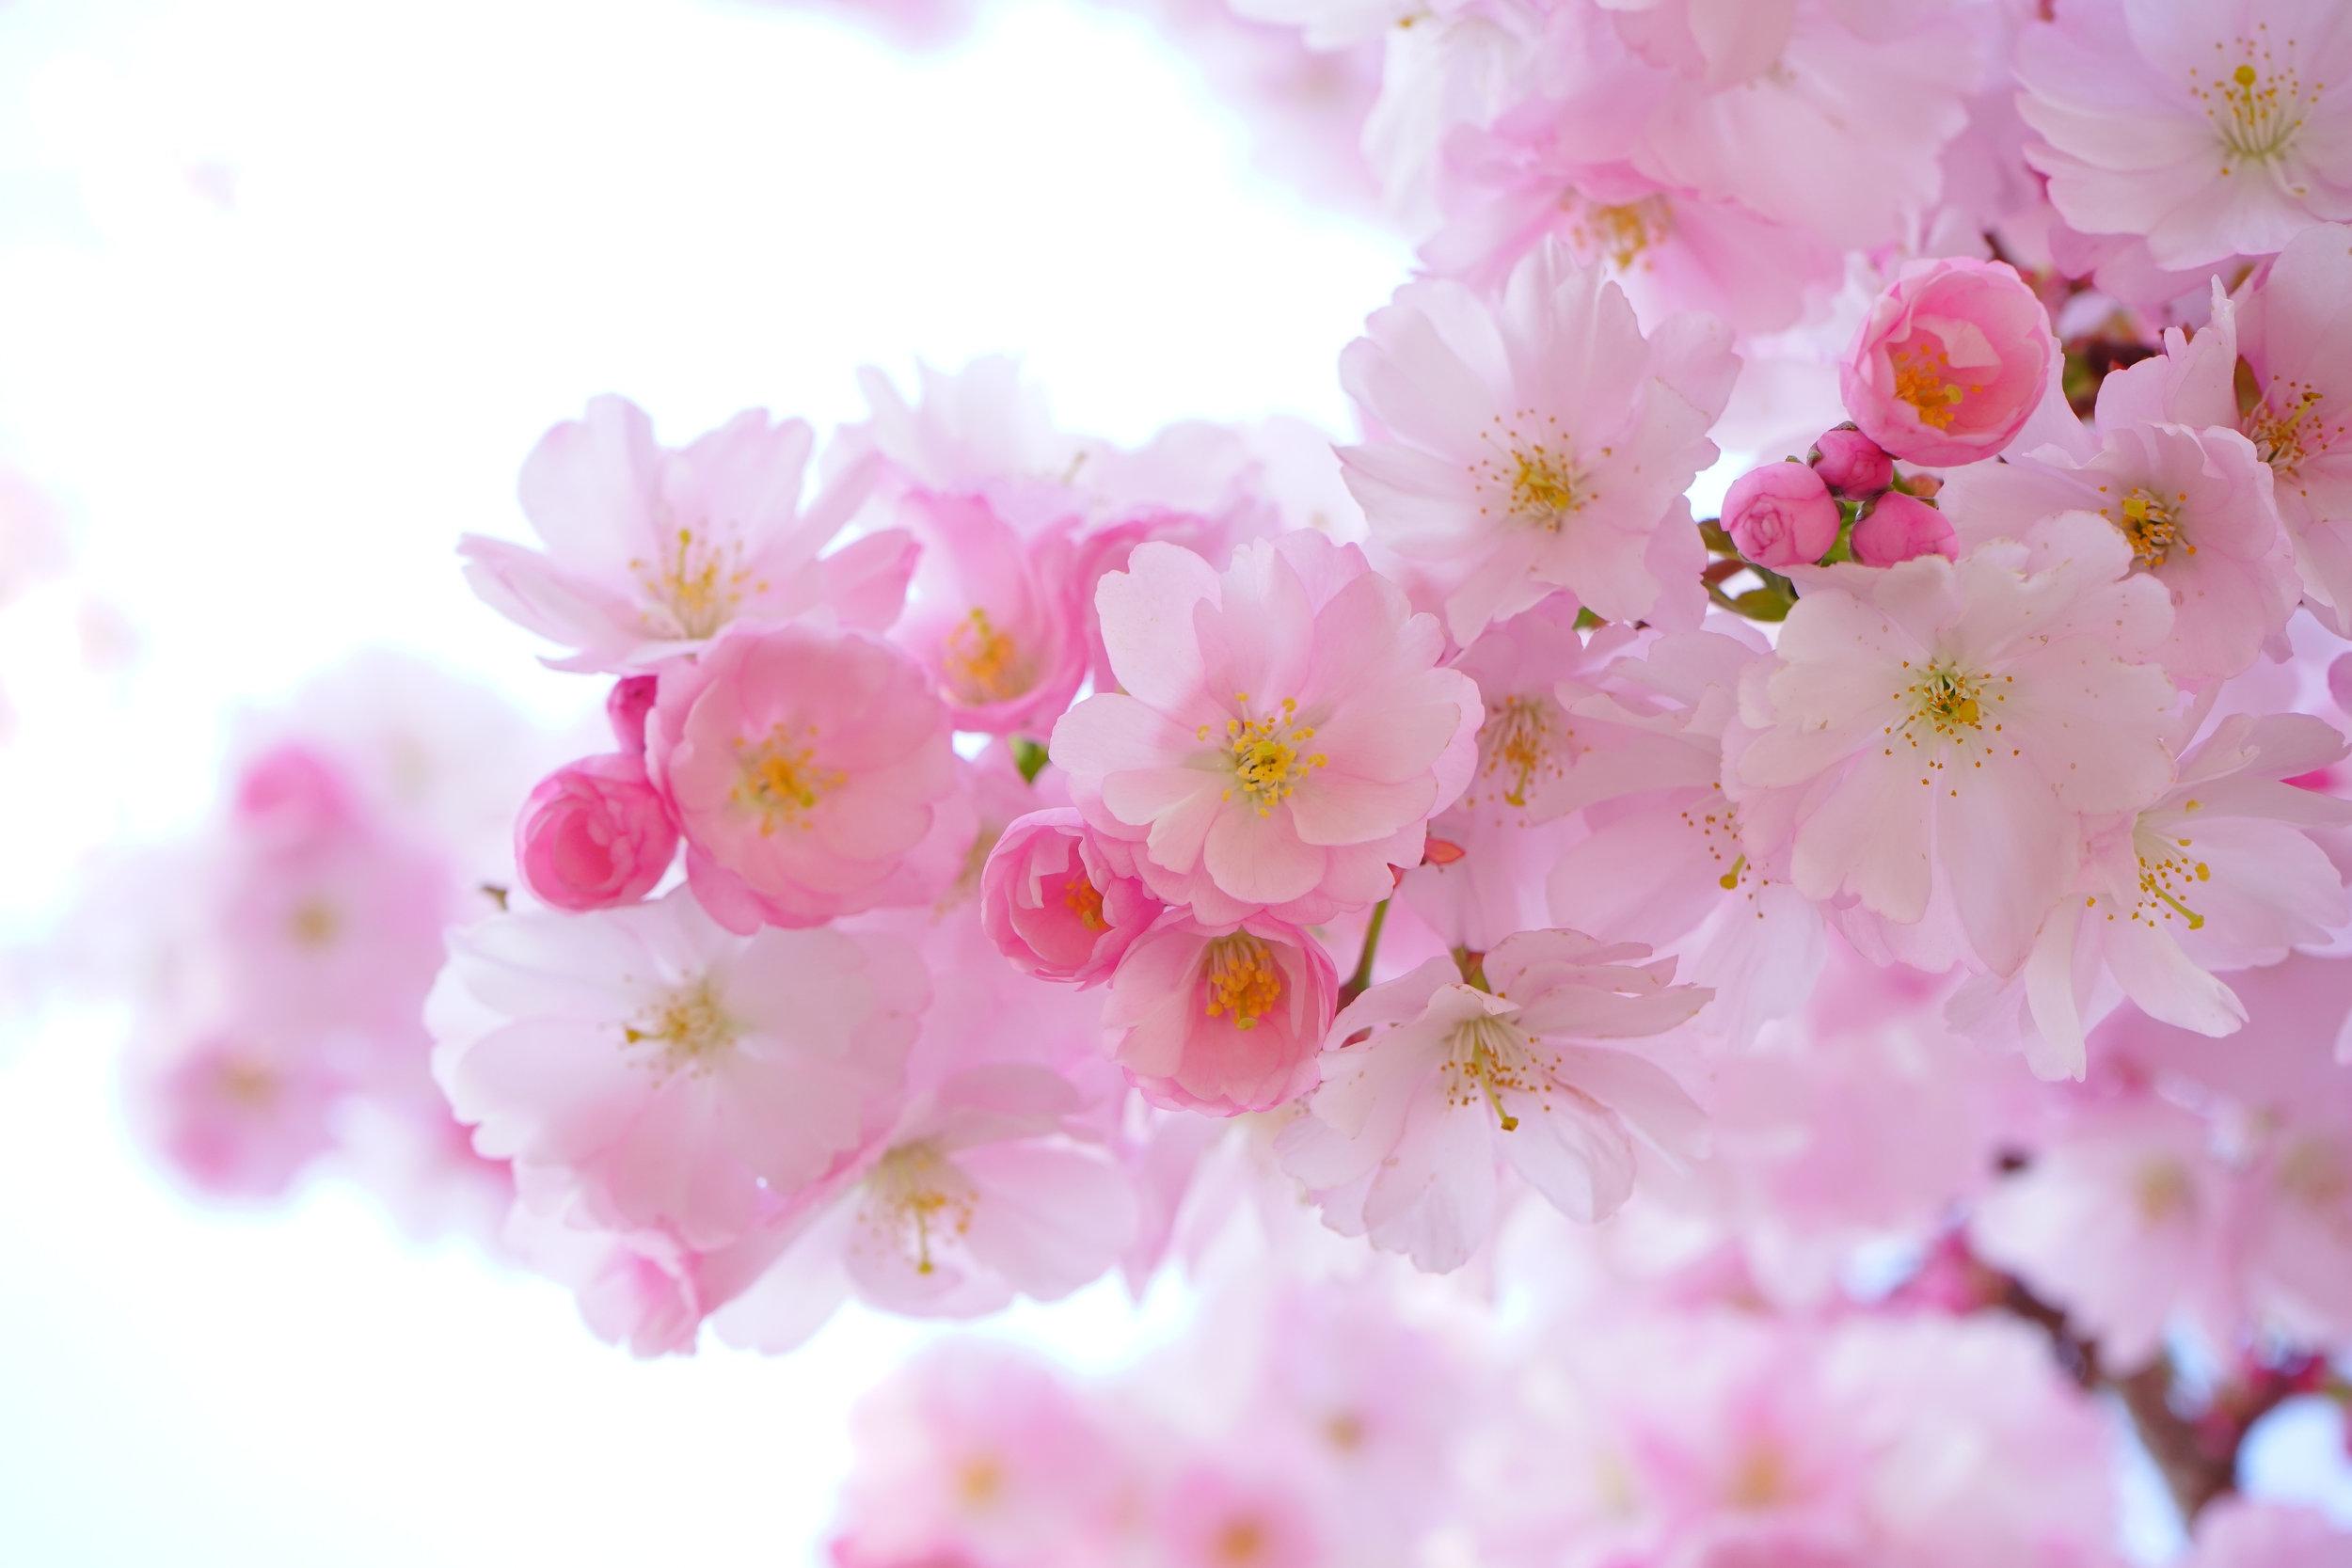 Canva - Pink Flowers.jpg